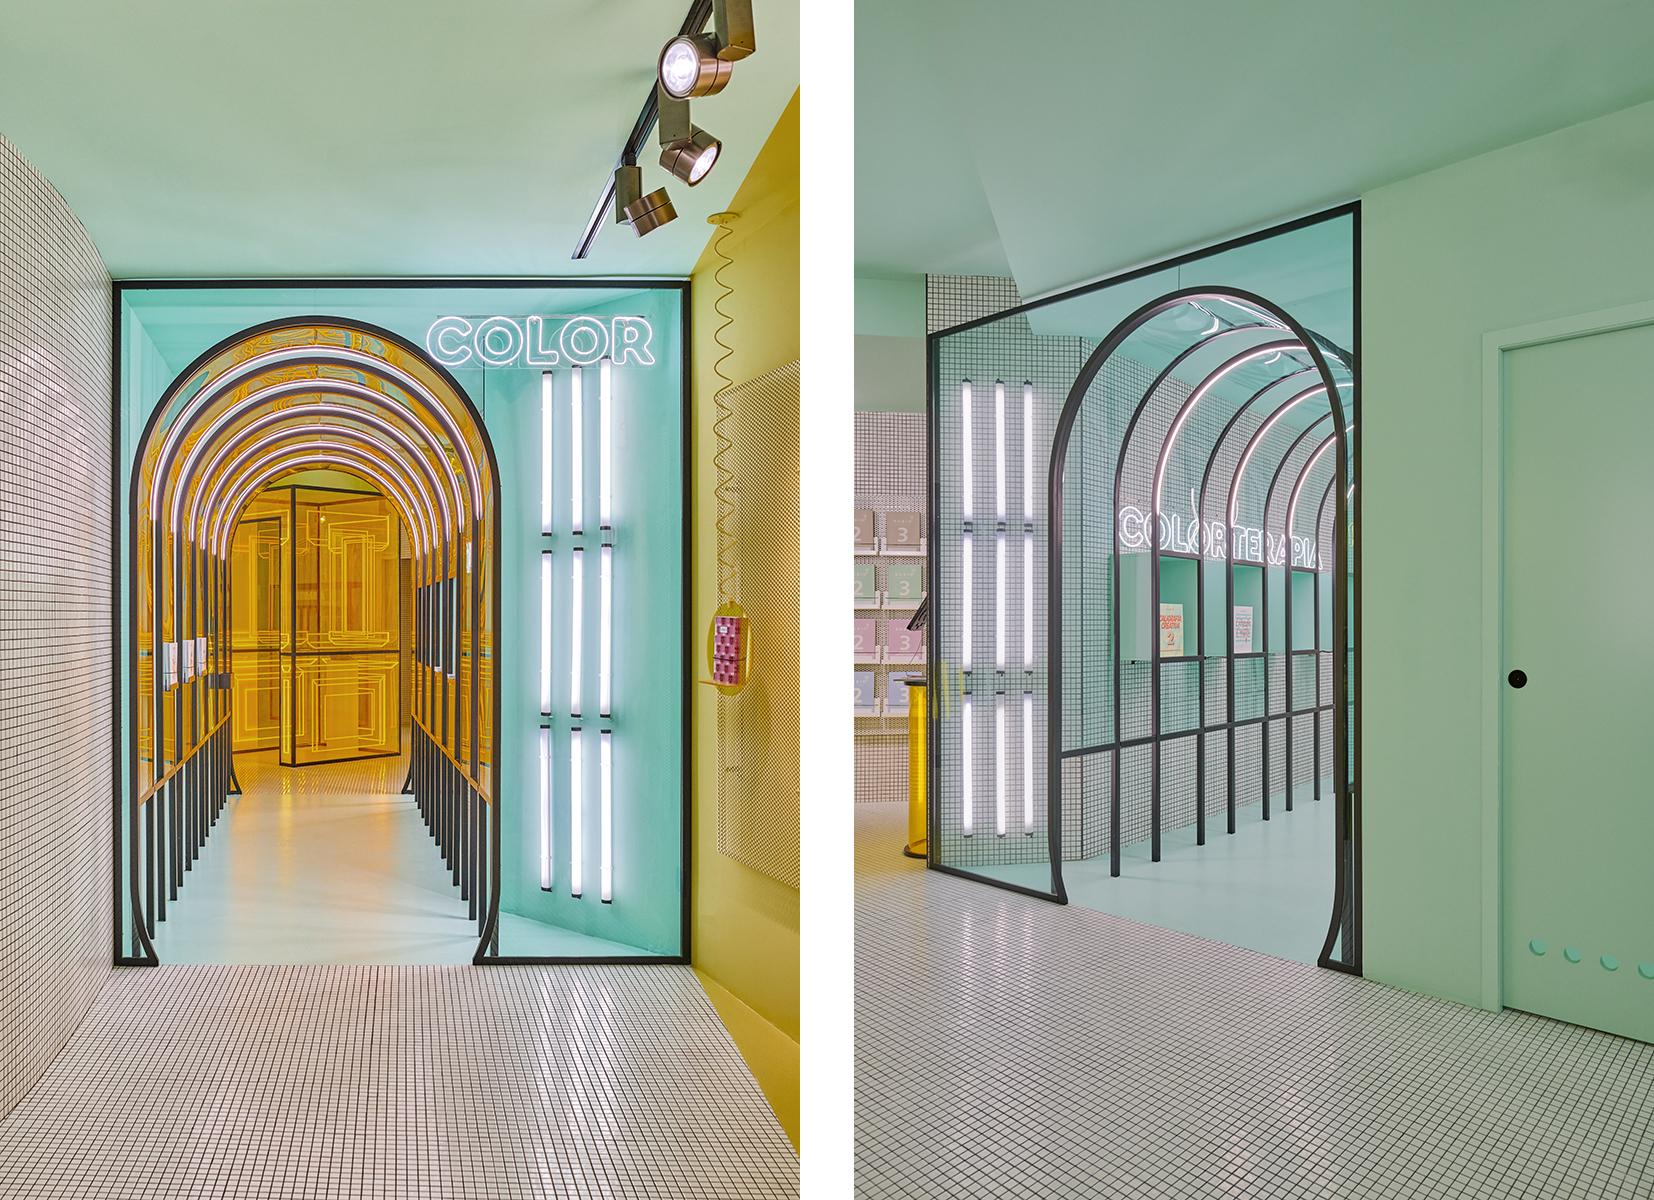 Masquespacio Cuardernos Rubio Visual Atelier 8 Architecture 3